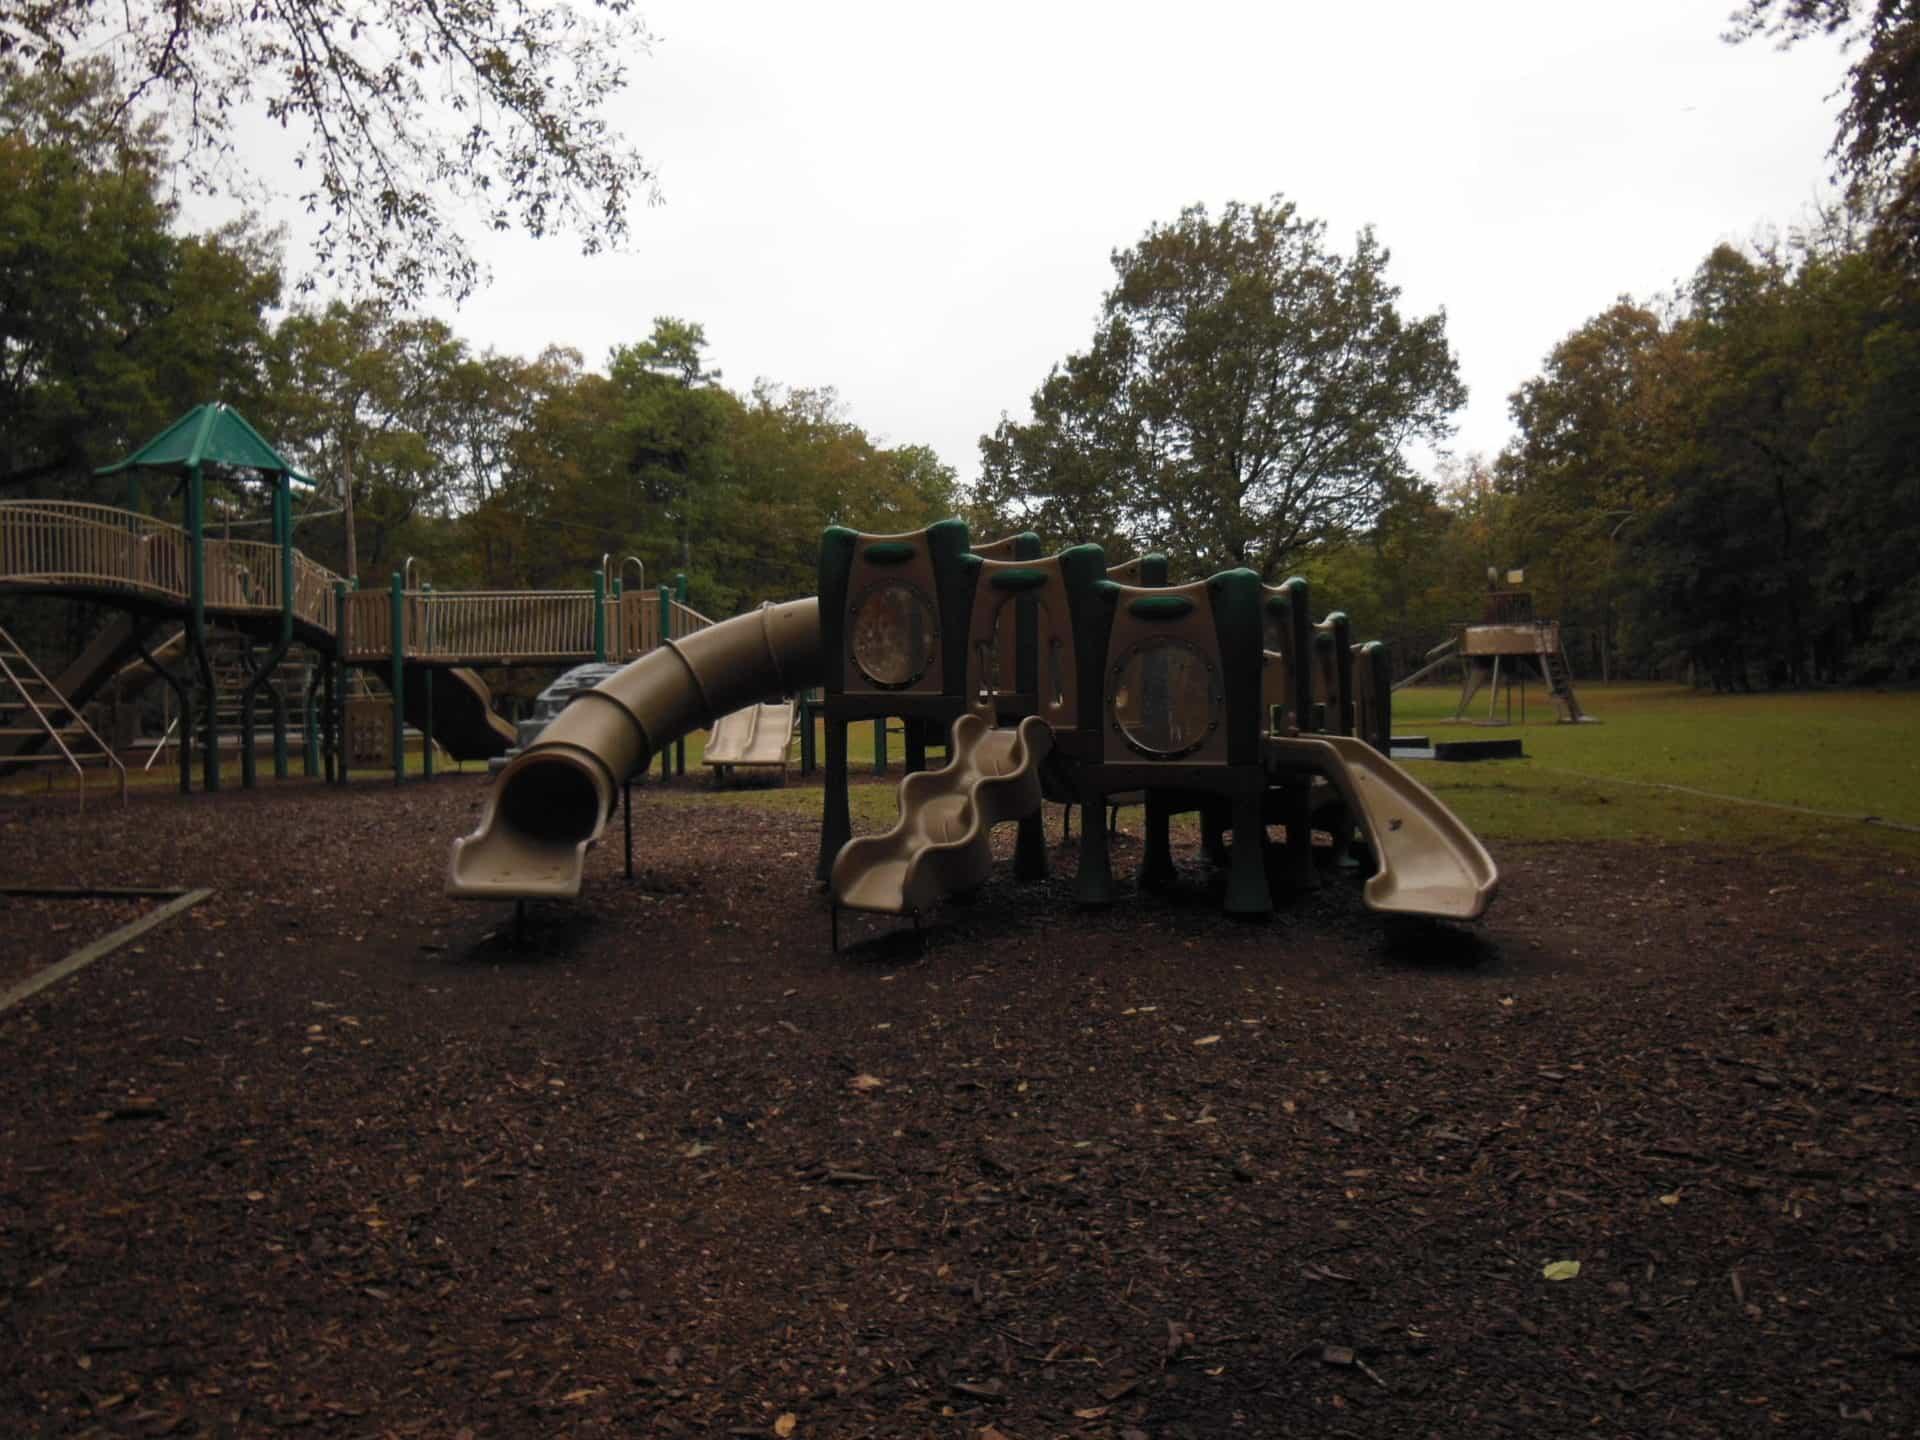 Monte Sano State Park - Playscape slides